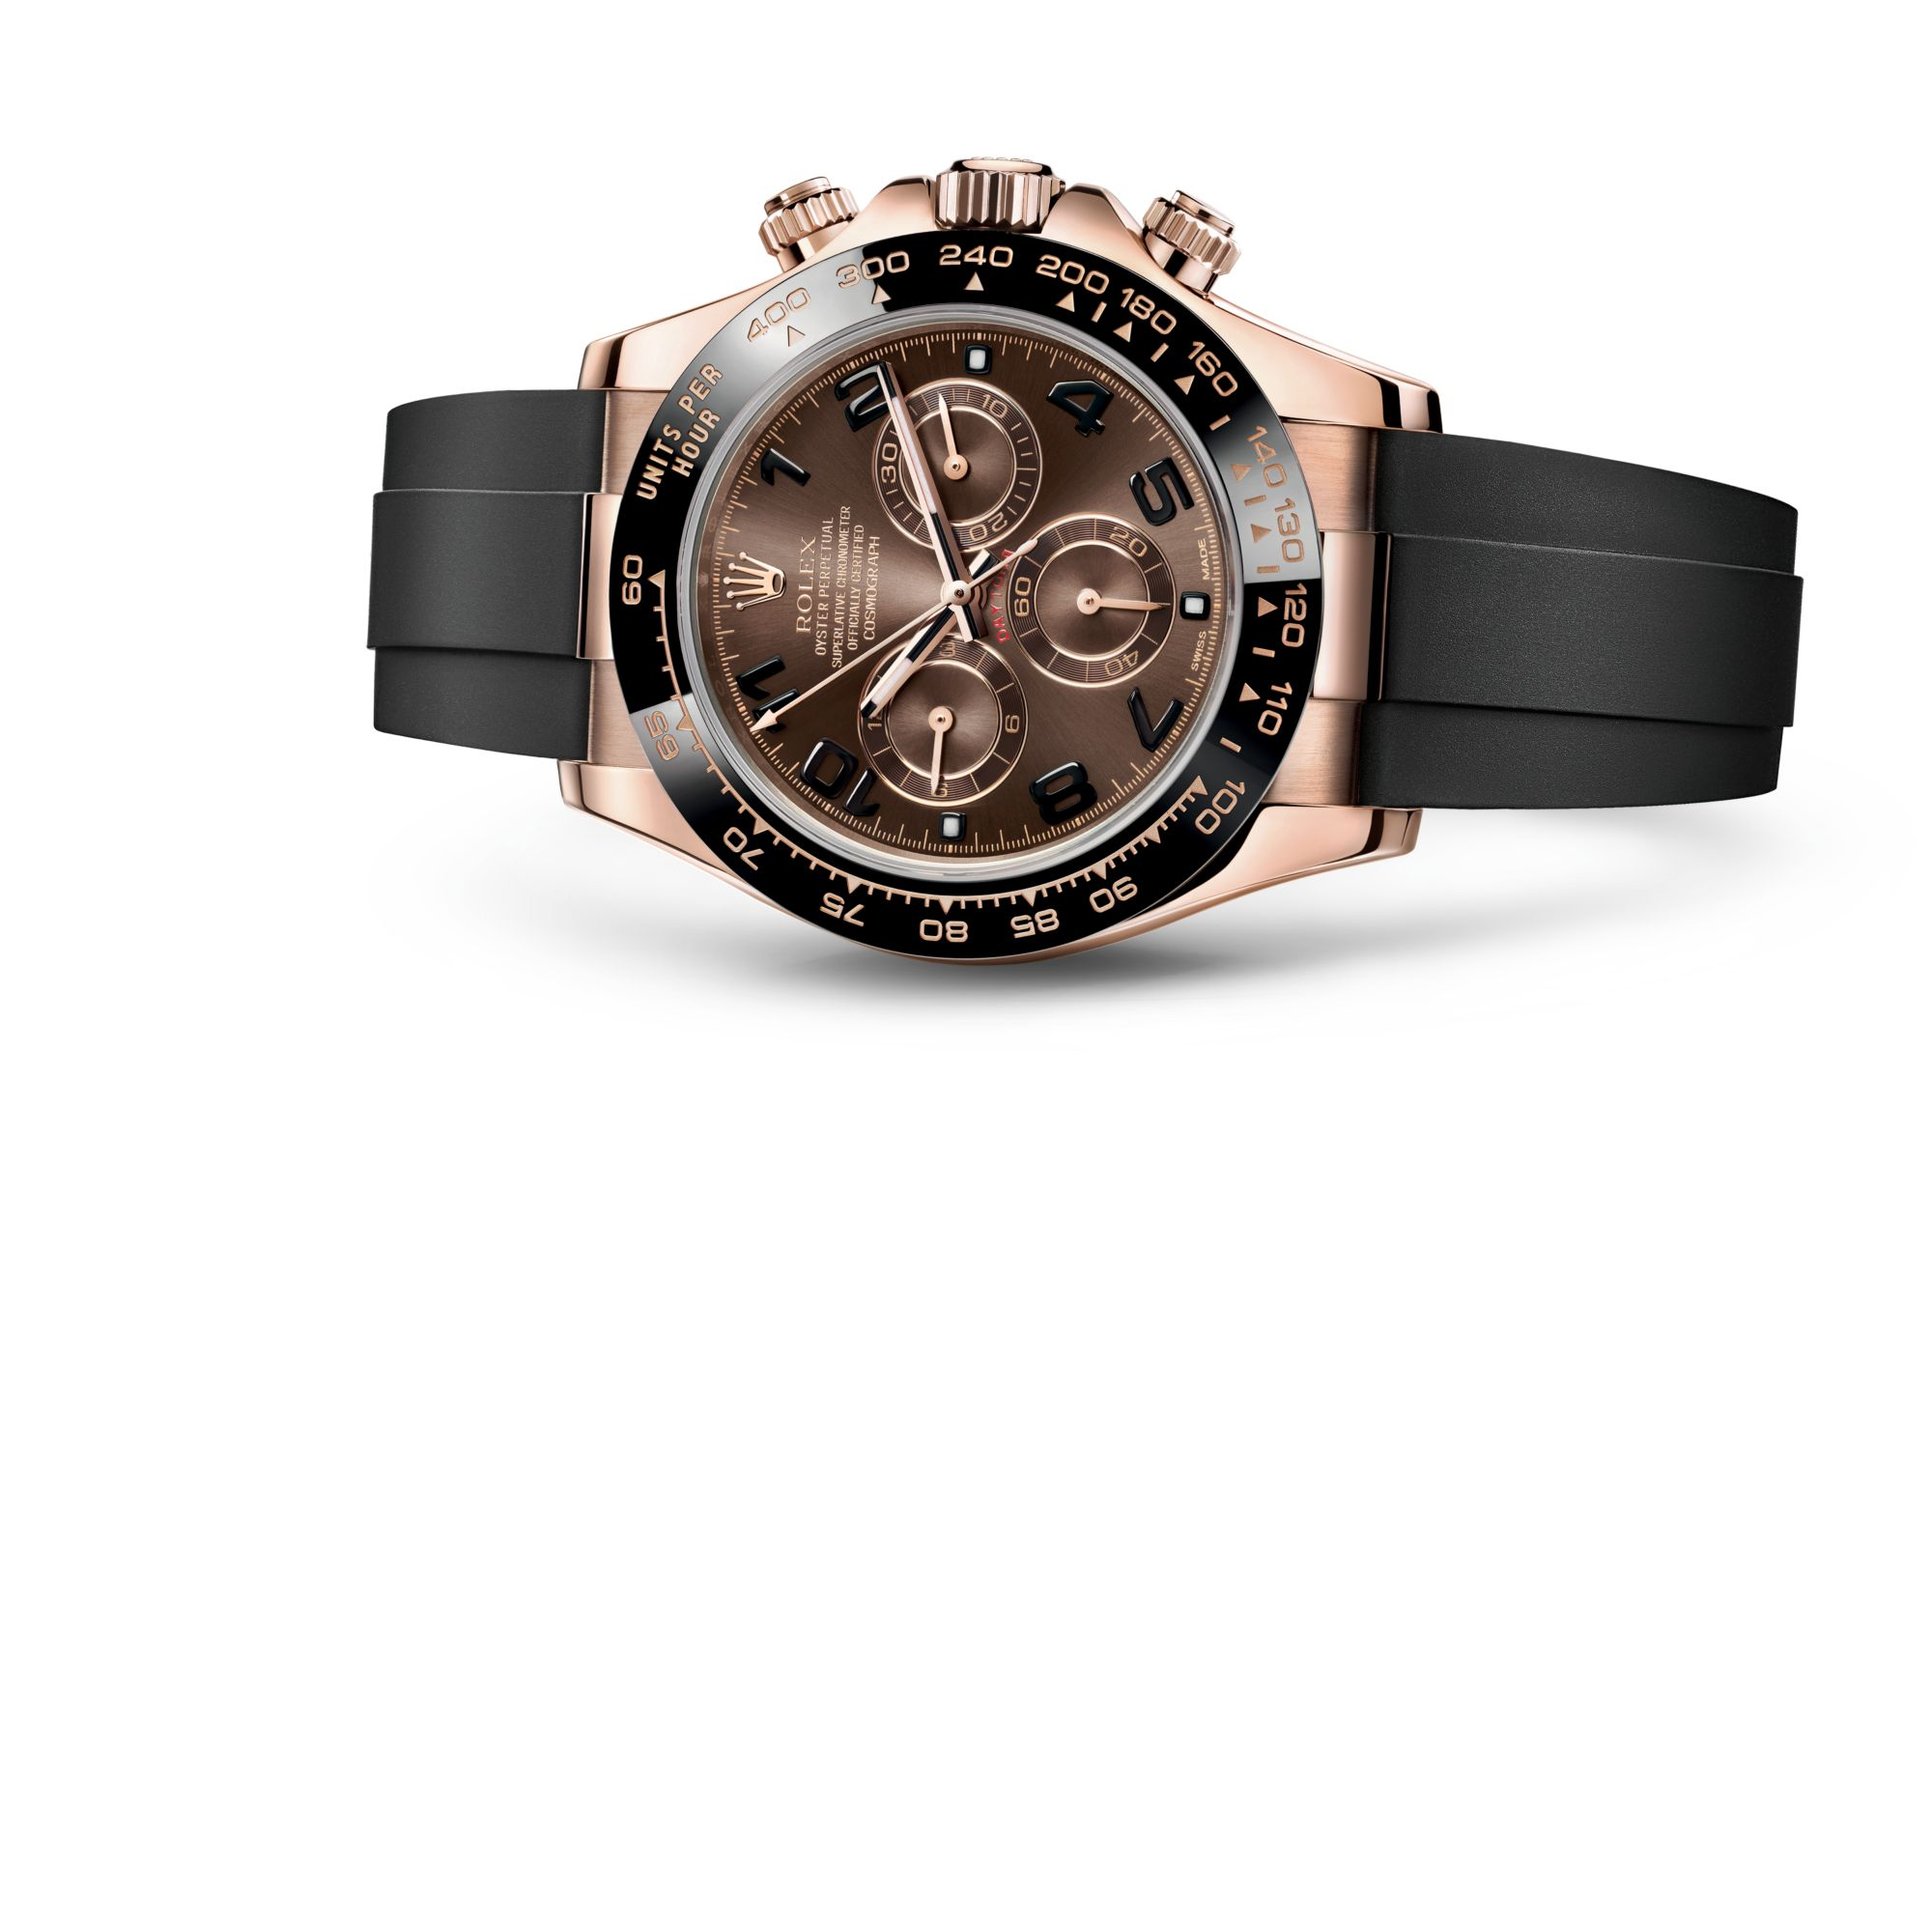 Rolex Cosmograph Daytona M116515LN-0015